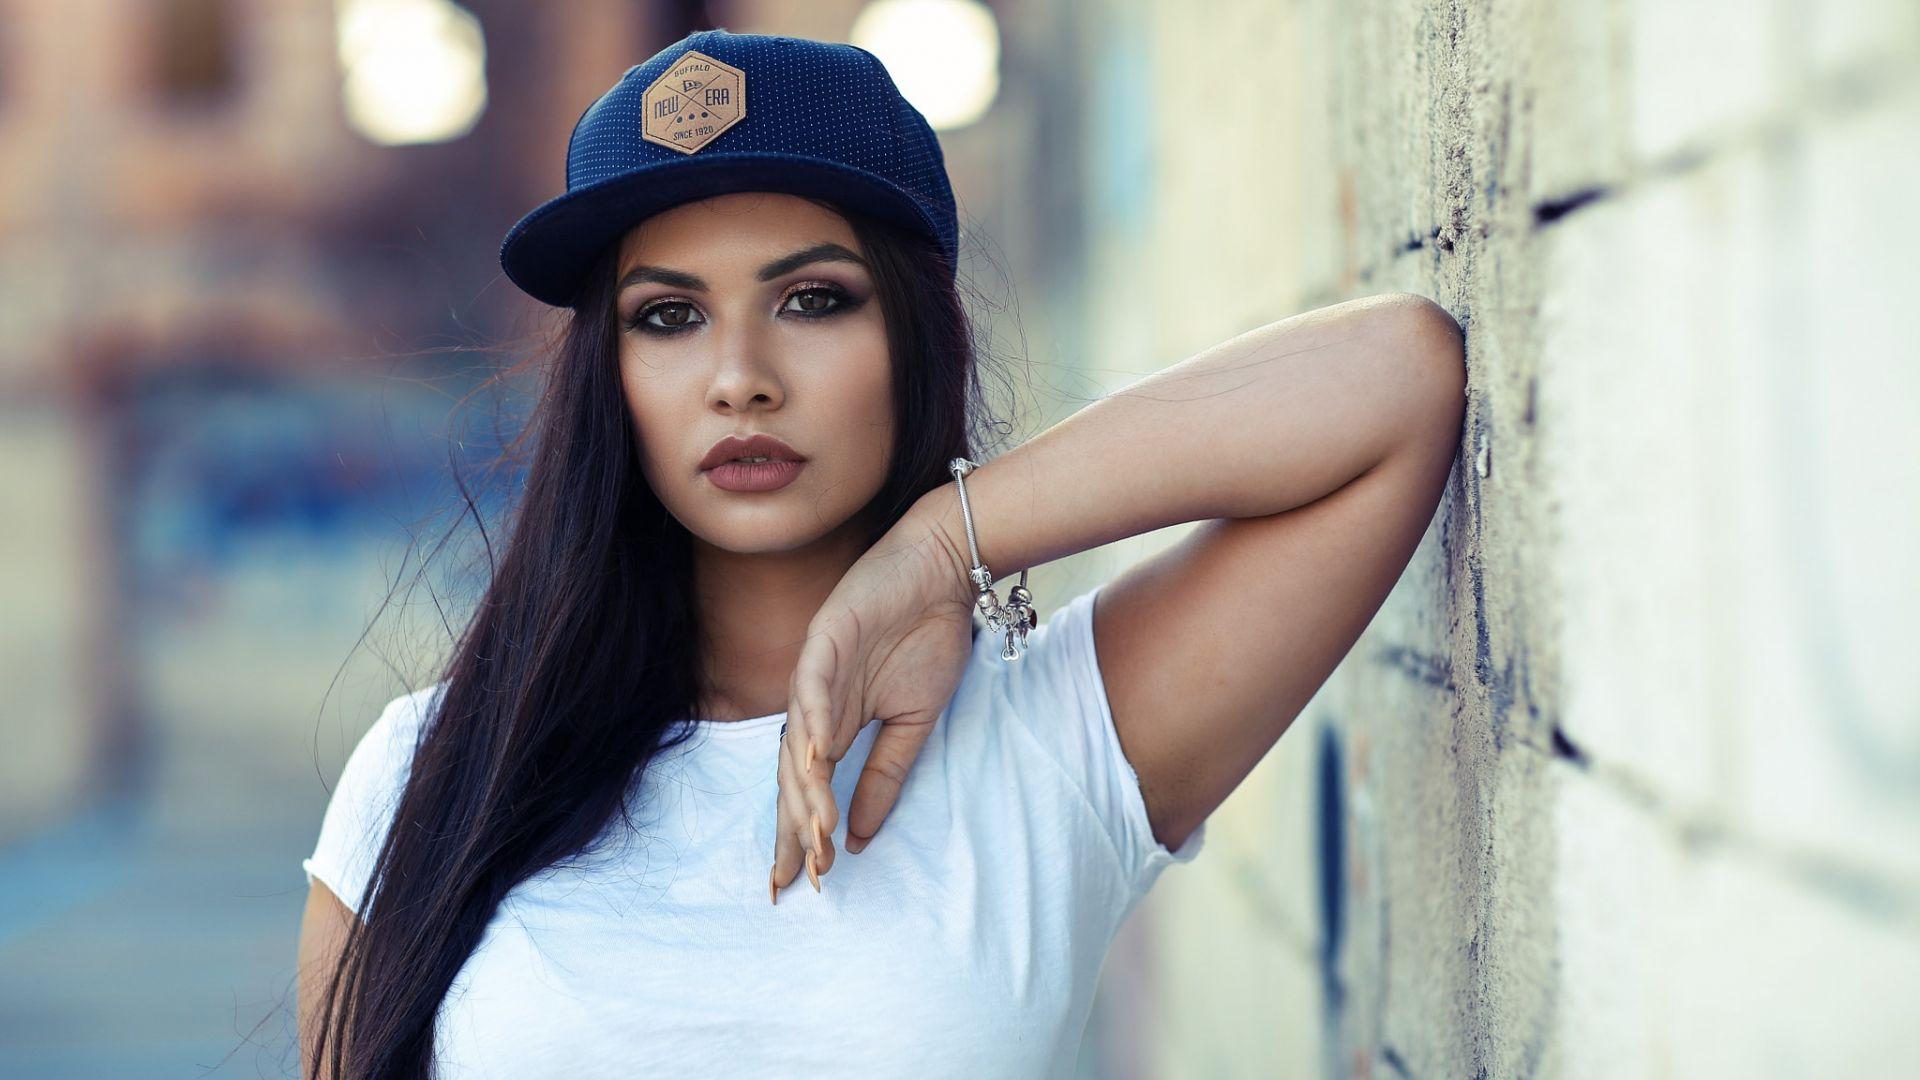 Wallpaper Wall, girl model, baseball cap